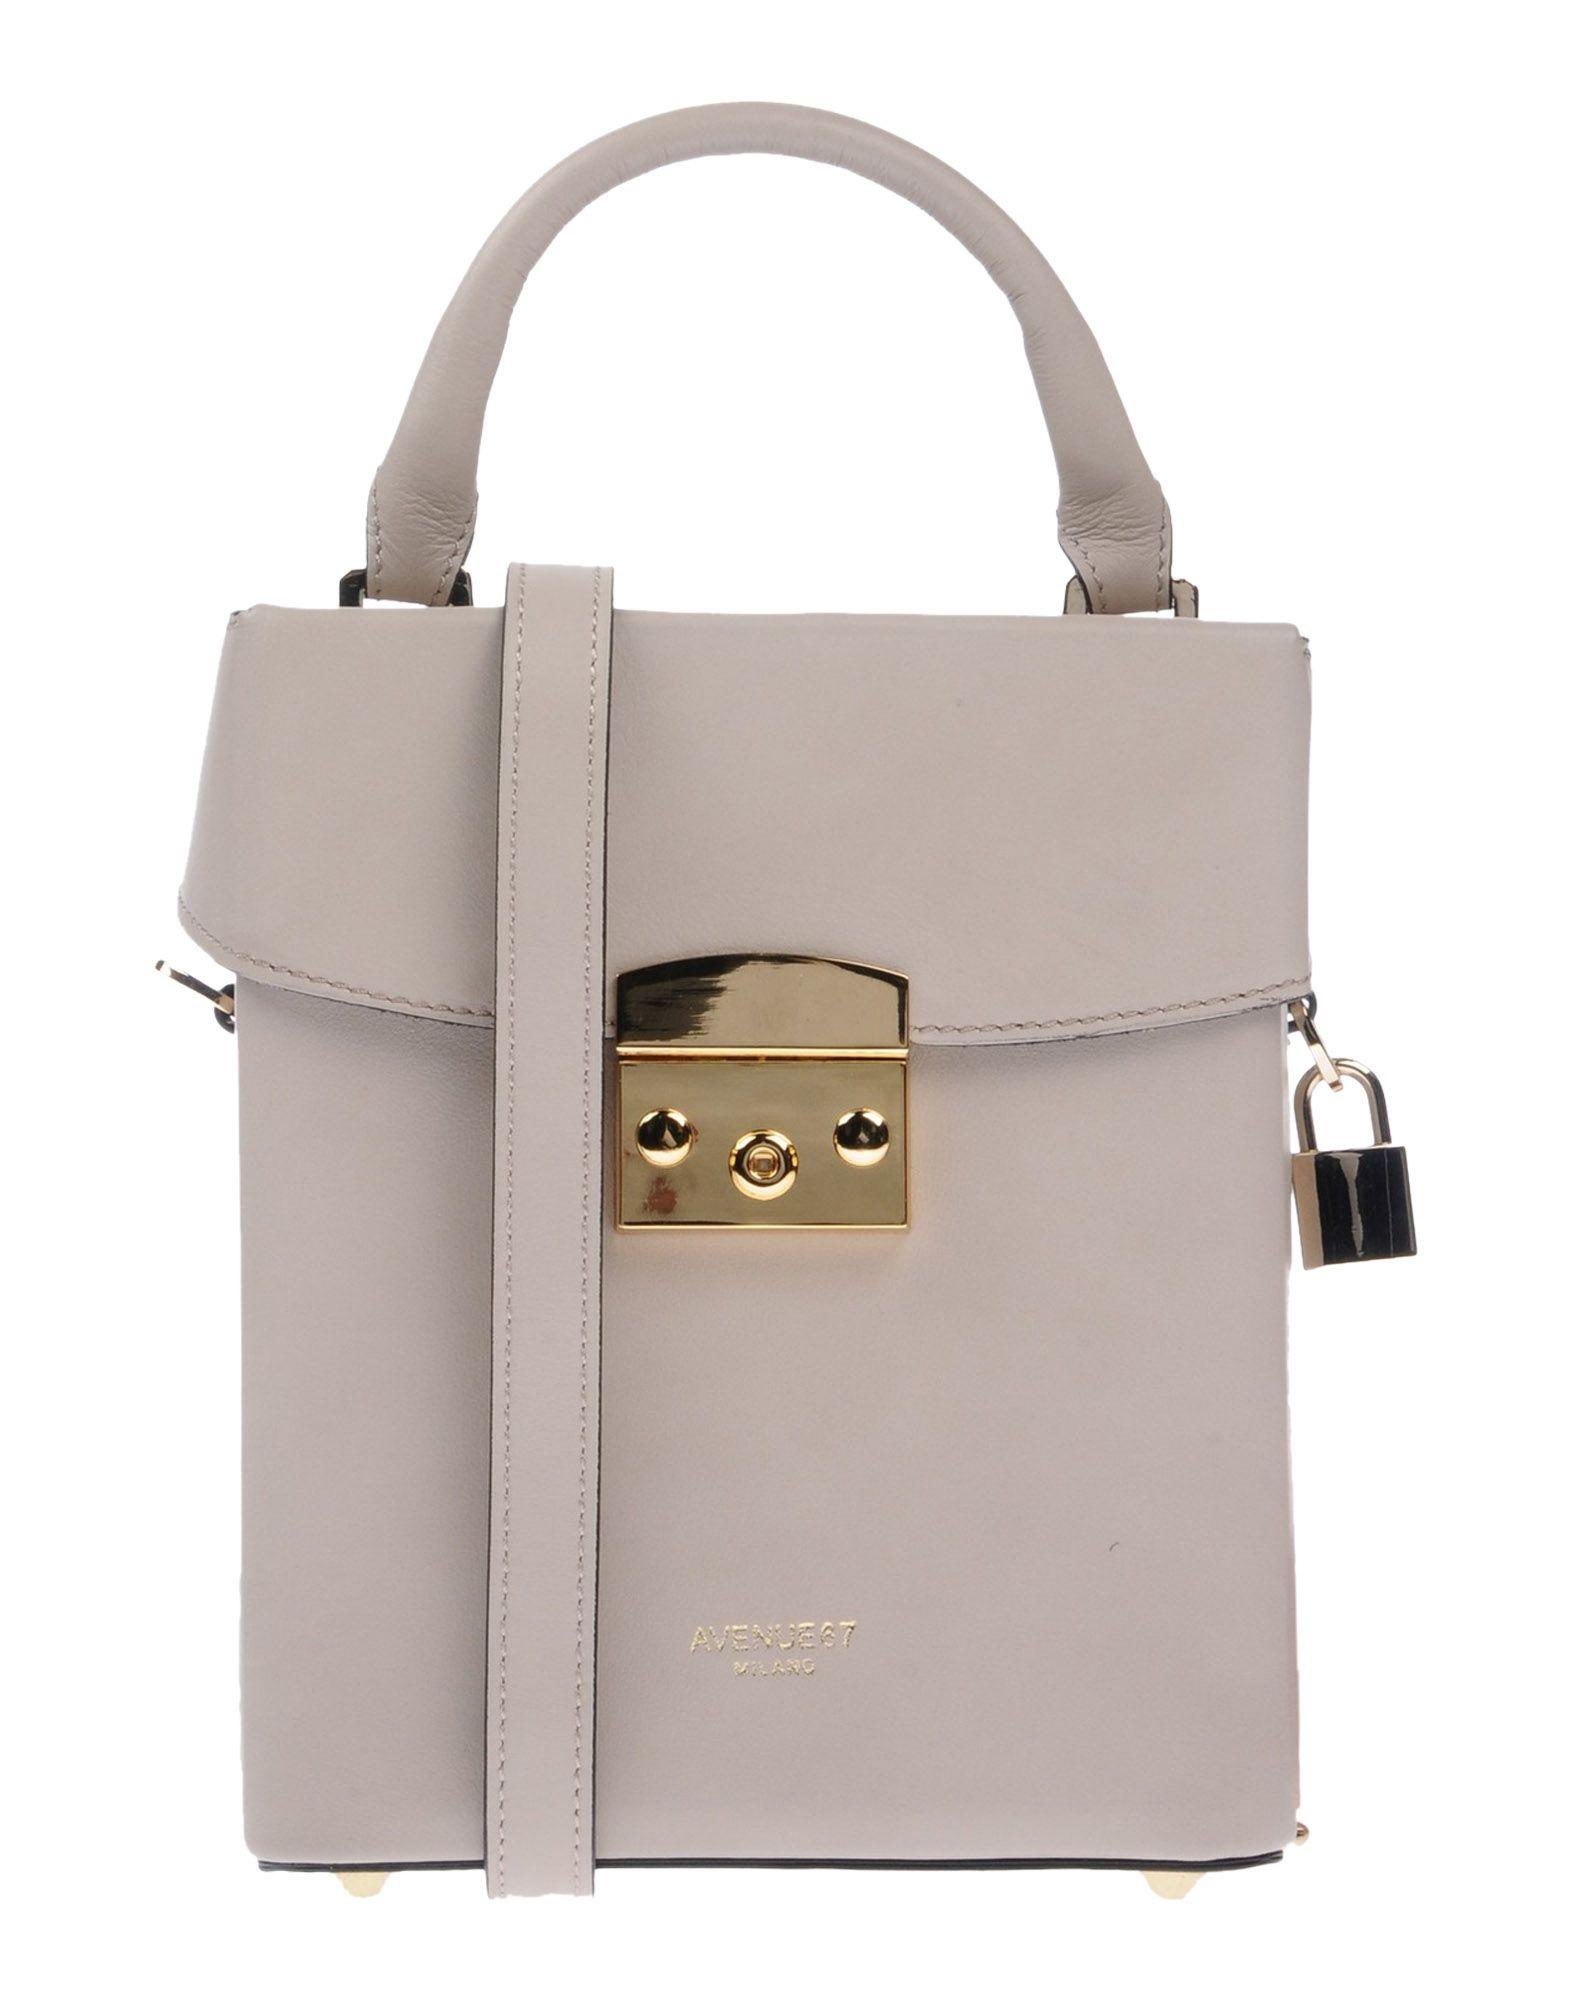 AVENUE 67 Handbags in Beige